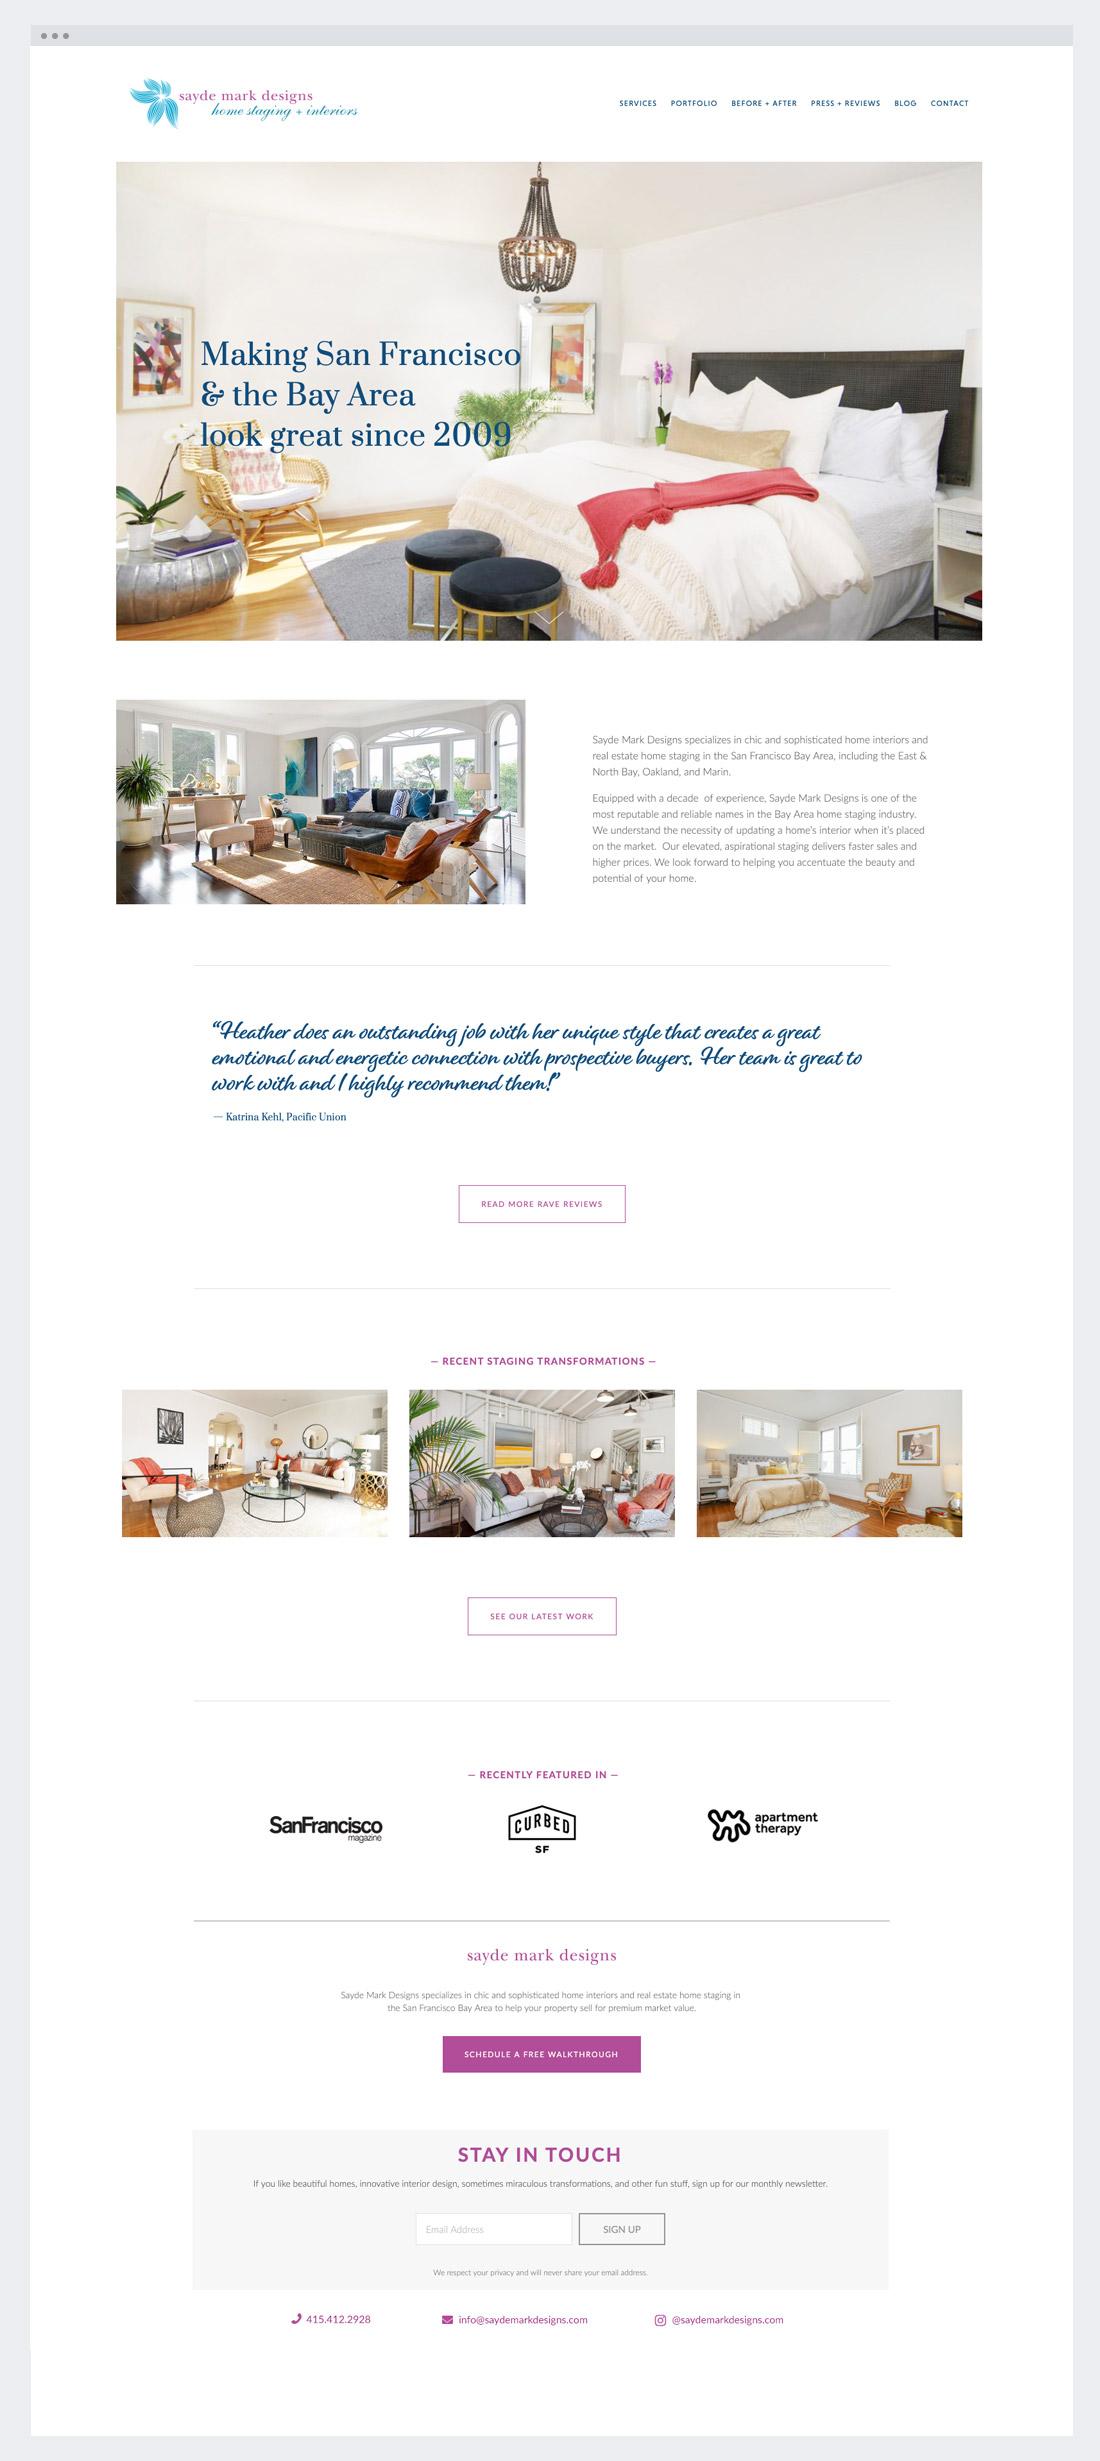 saydemark_home2.jpg